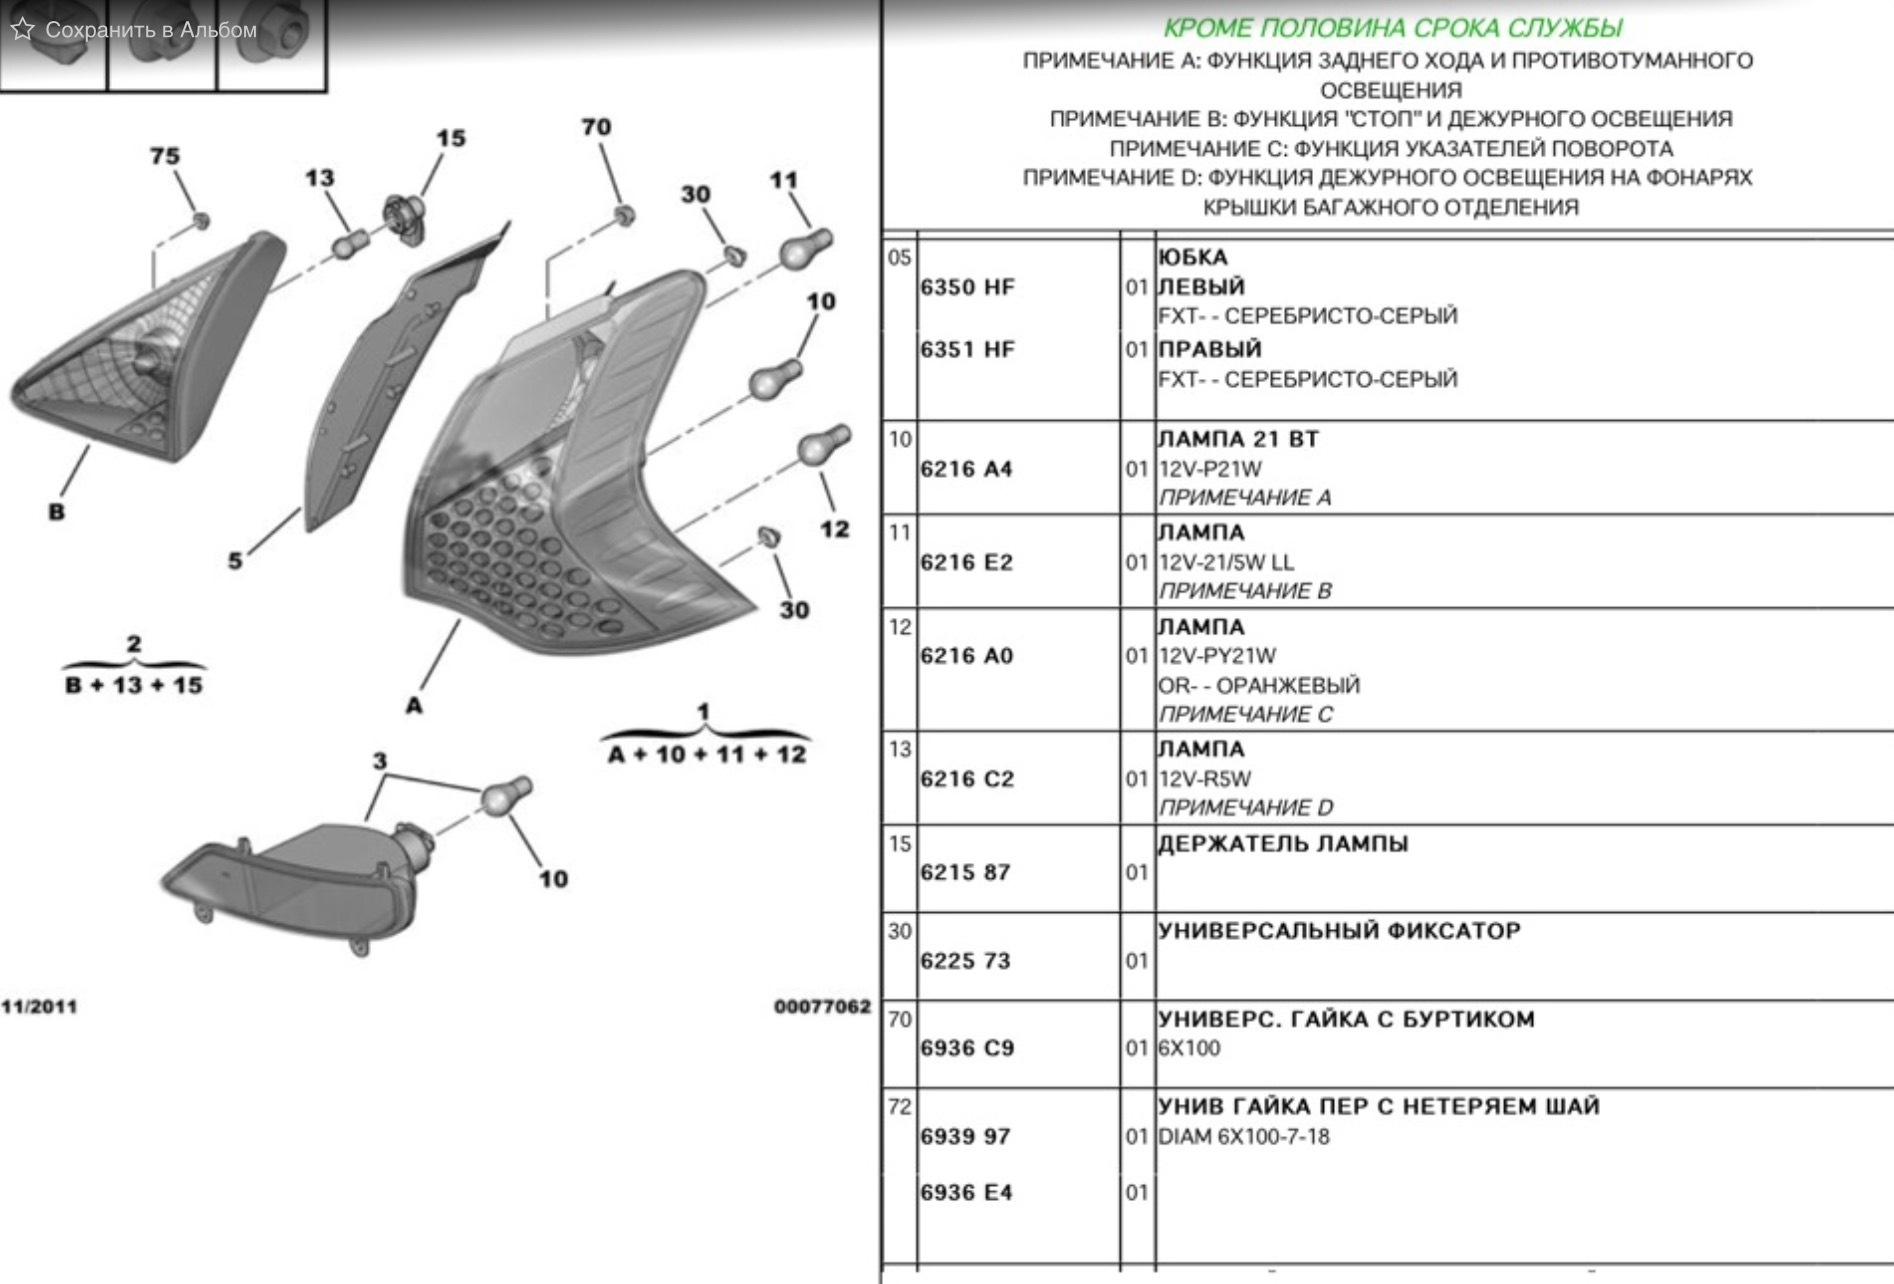 Замена ламп двери багажника+подсветки номера — logbook